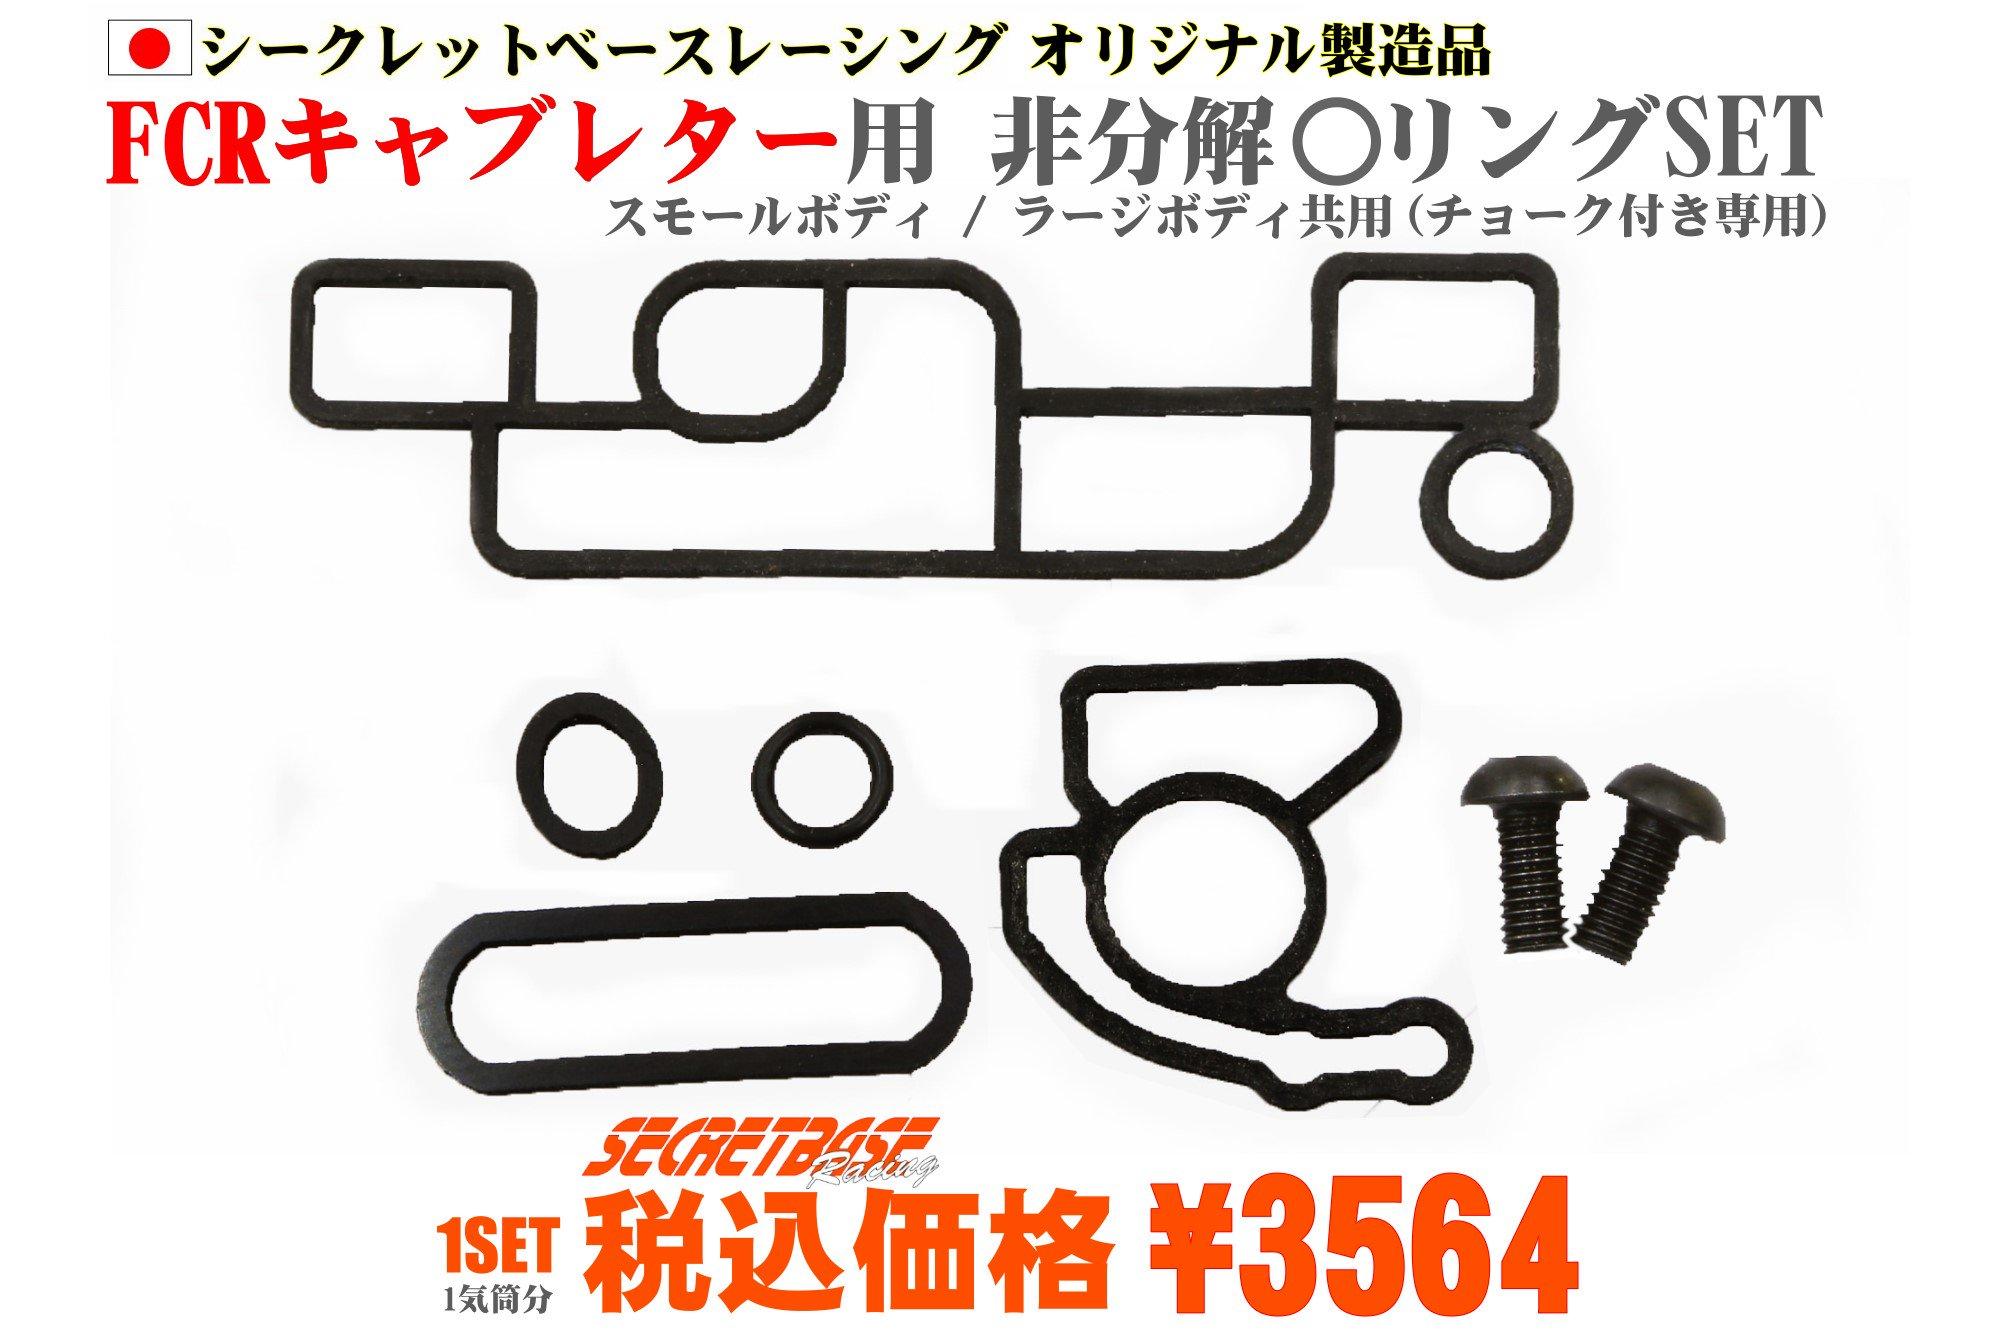 FCRキャブレター用 非分解箇所OリングSET (チョーク付き専用)